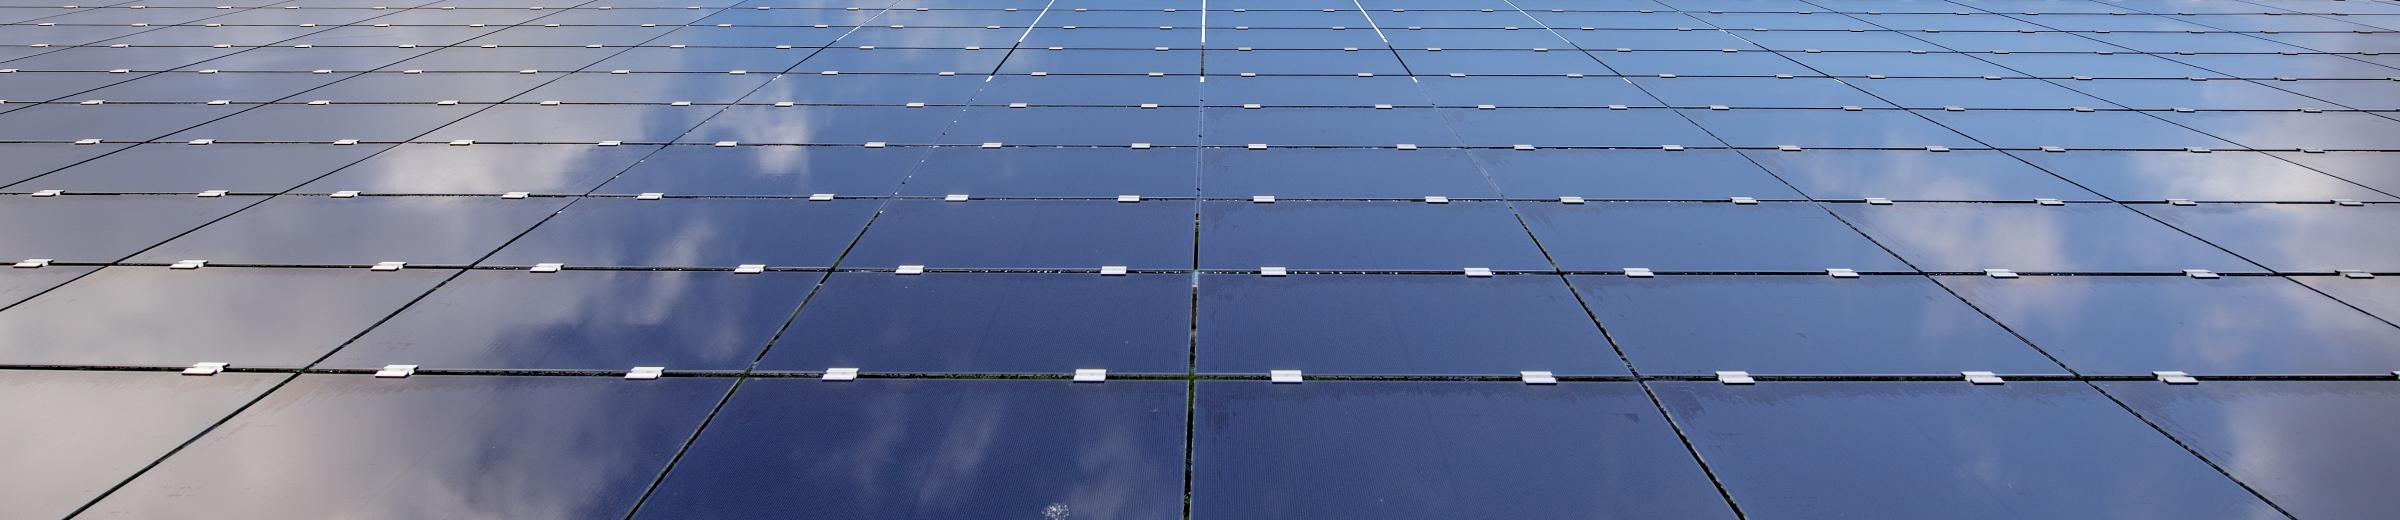 Solar panels reflecting sky